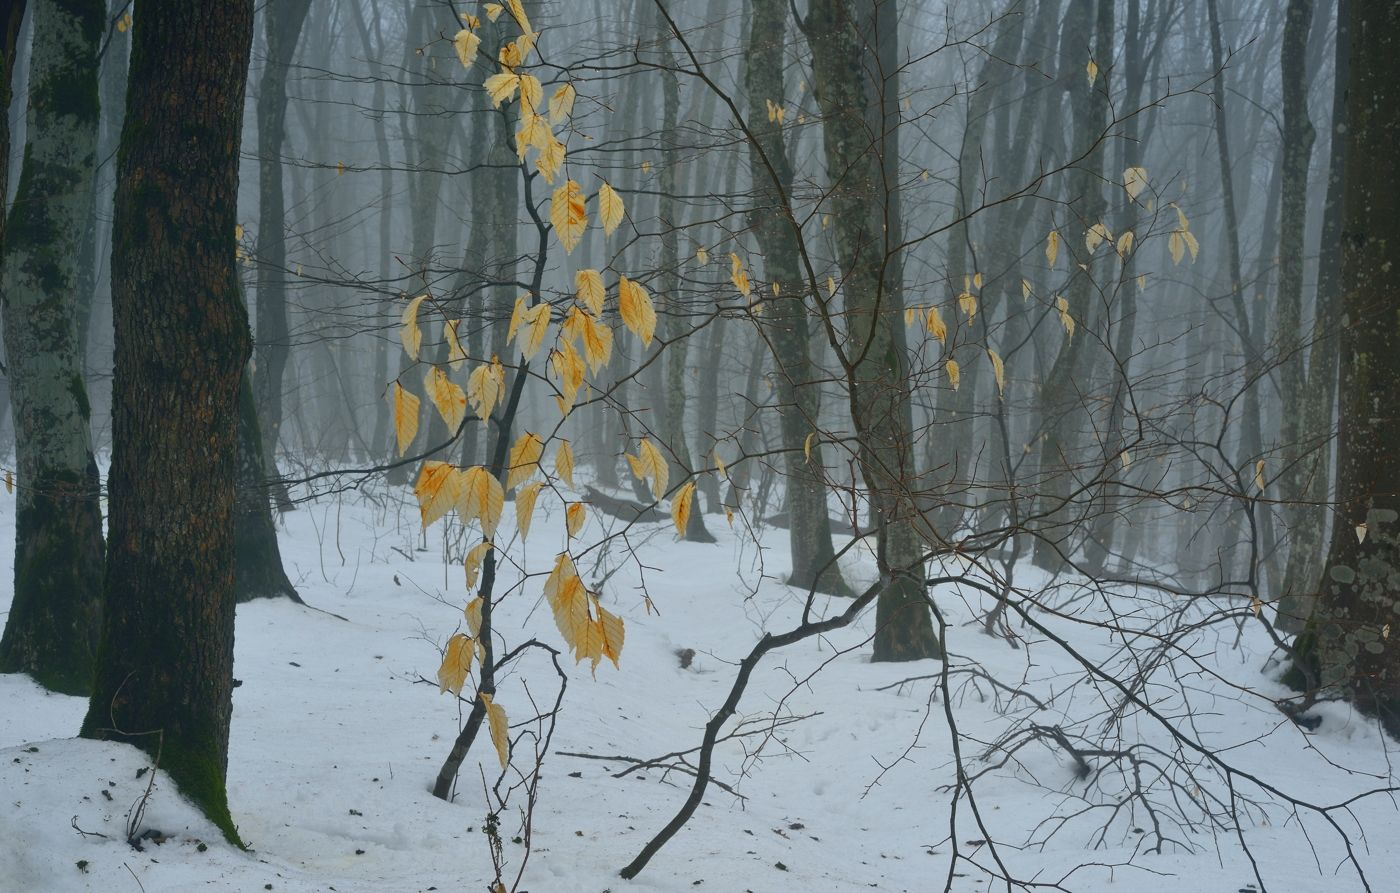 Воспоминание об осени зима лес снег листва